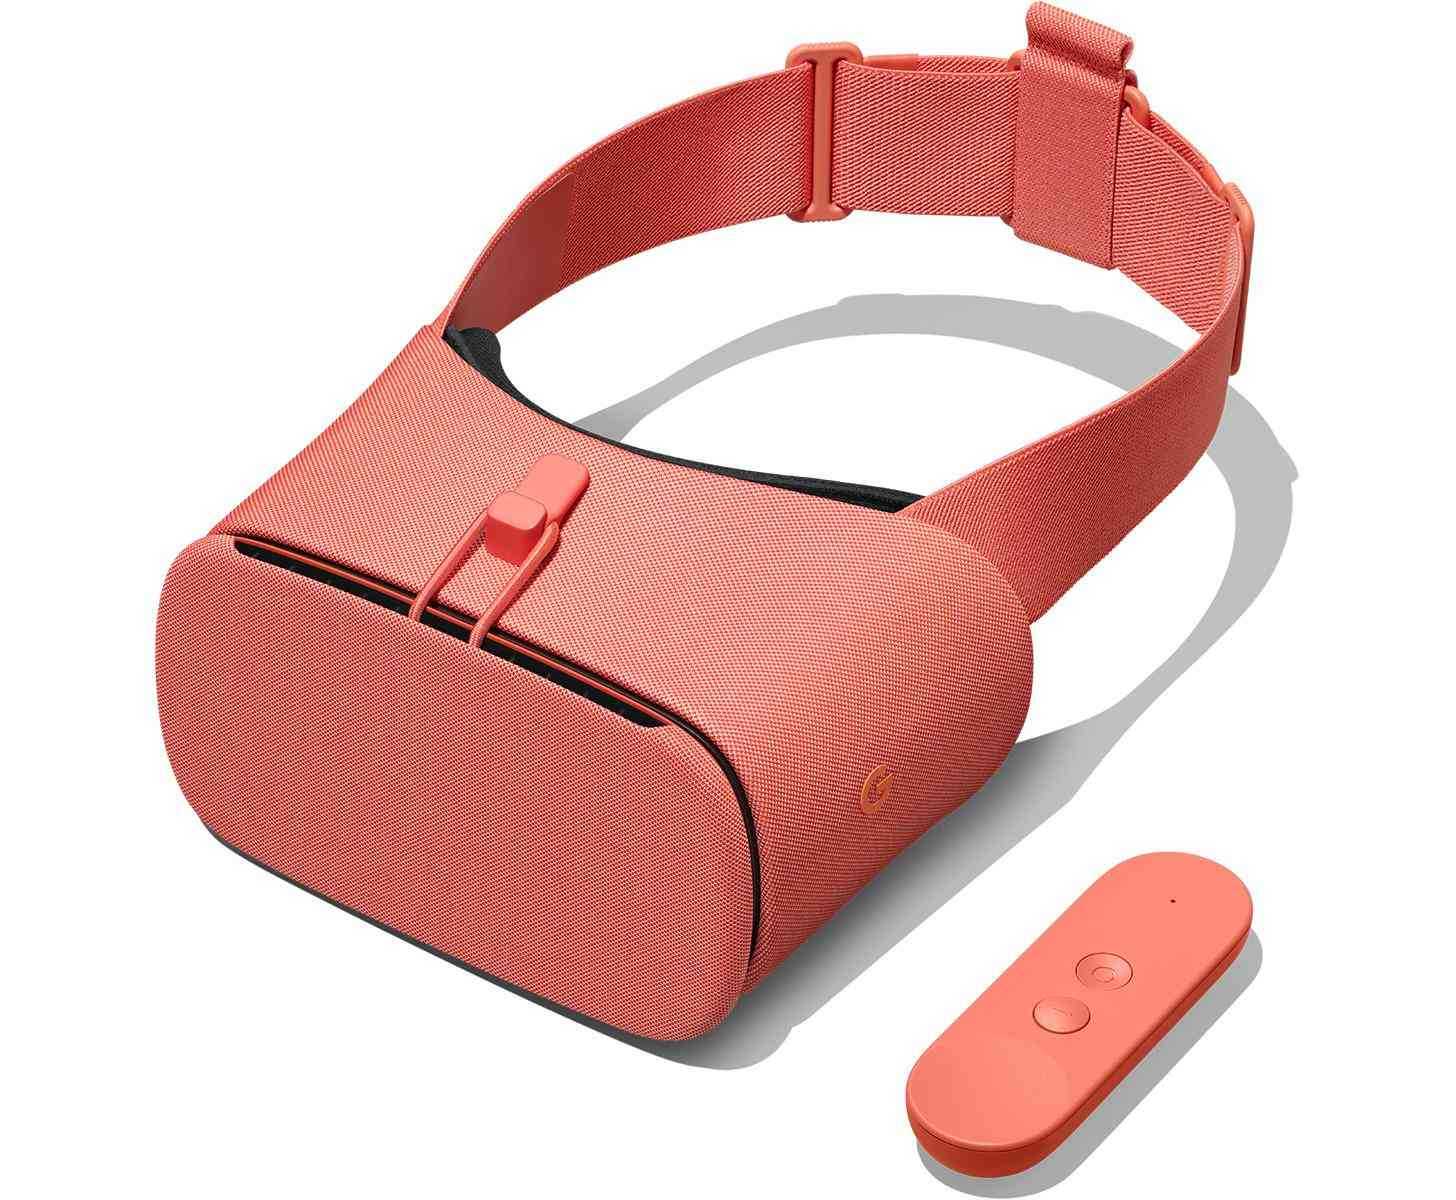 Google Daydream View VR headset 2017